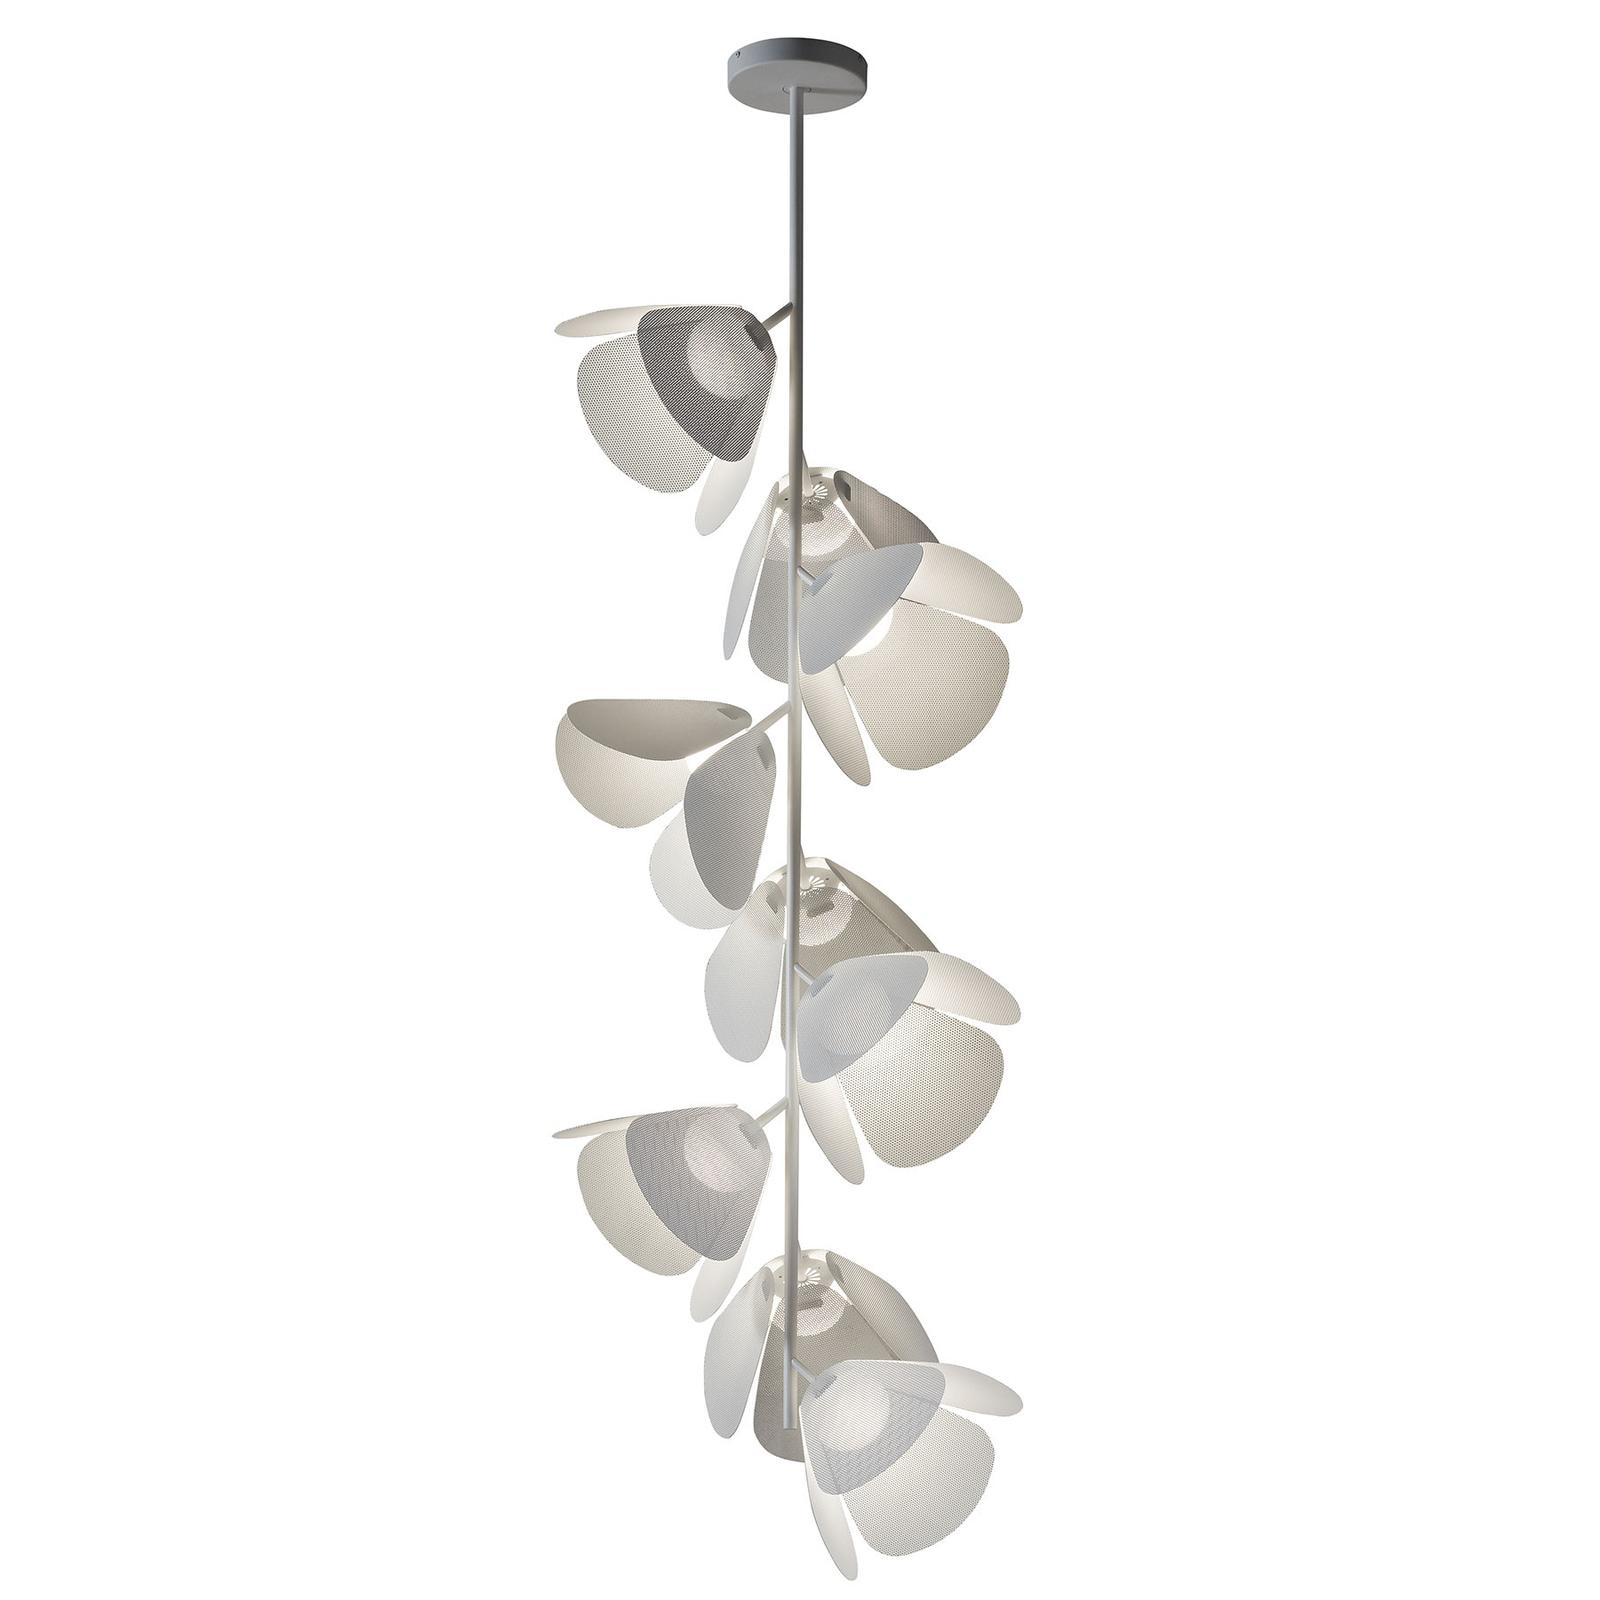 Bover Mod PF/73/9L LED-Deckenlampe weiß perforiert